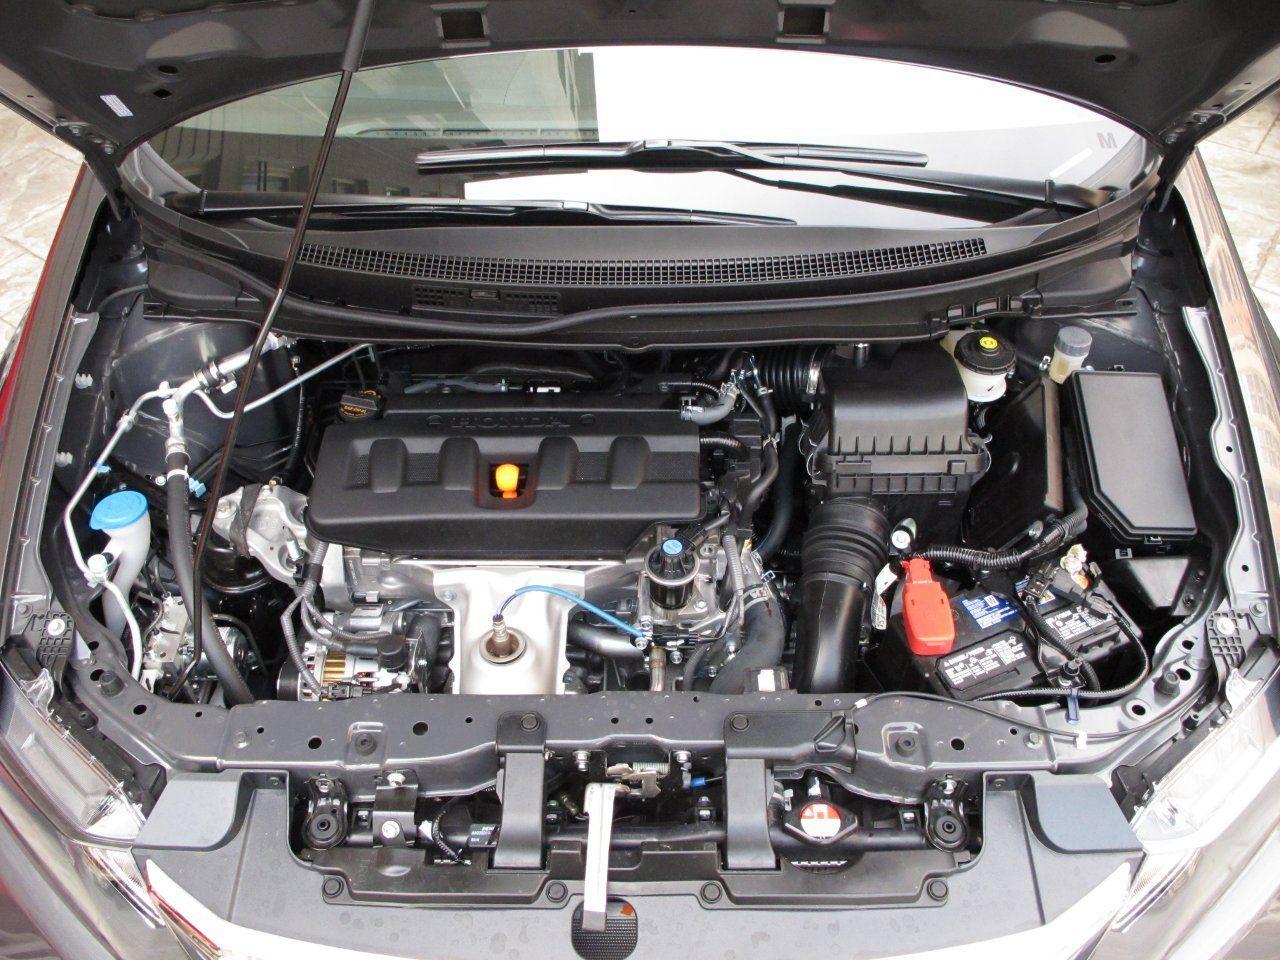 2012 Honda Civic Used Engine Description Gas Engine 1